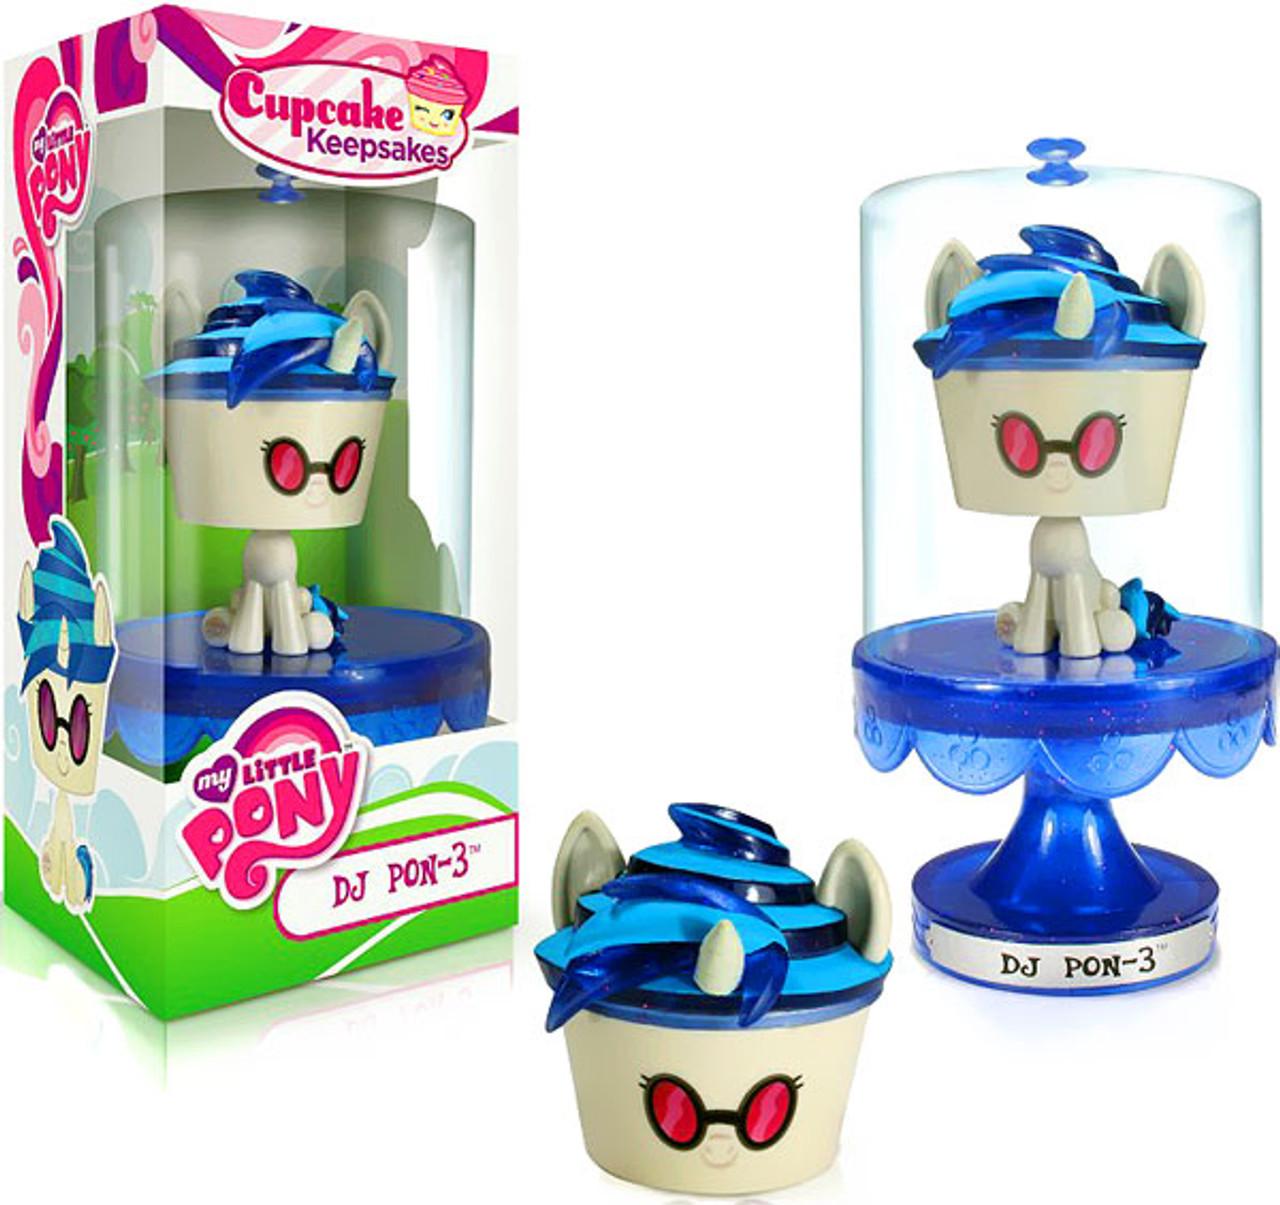 Funko My Little Pony Cupcake Keepsakes DJ Pon-3 Cupcake Keepsake